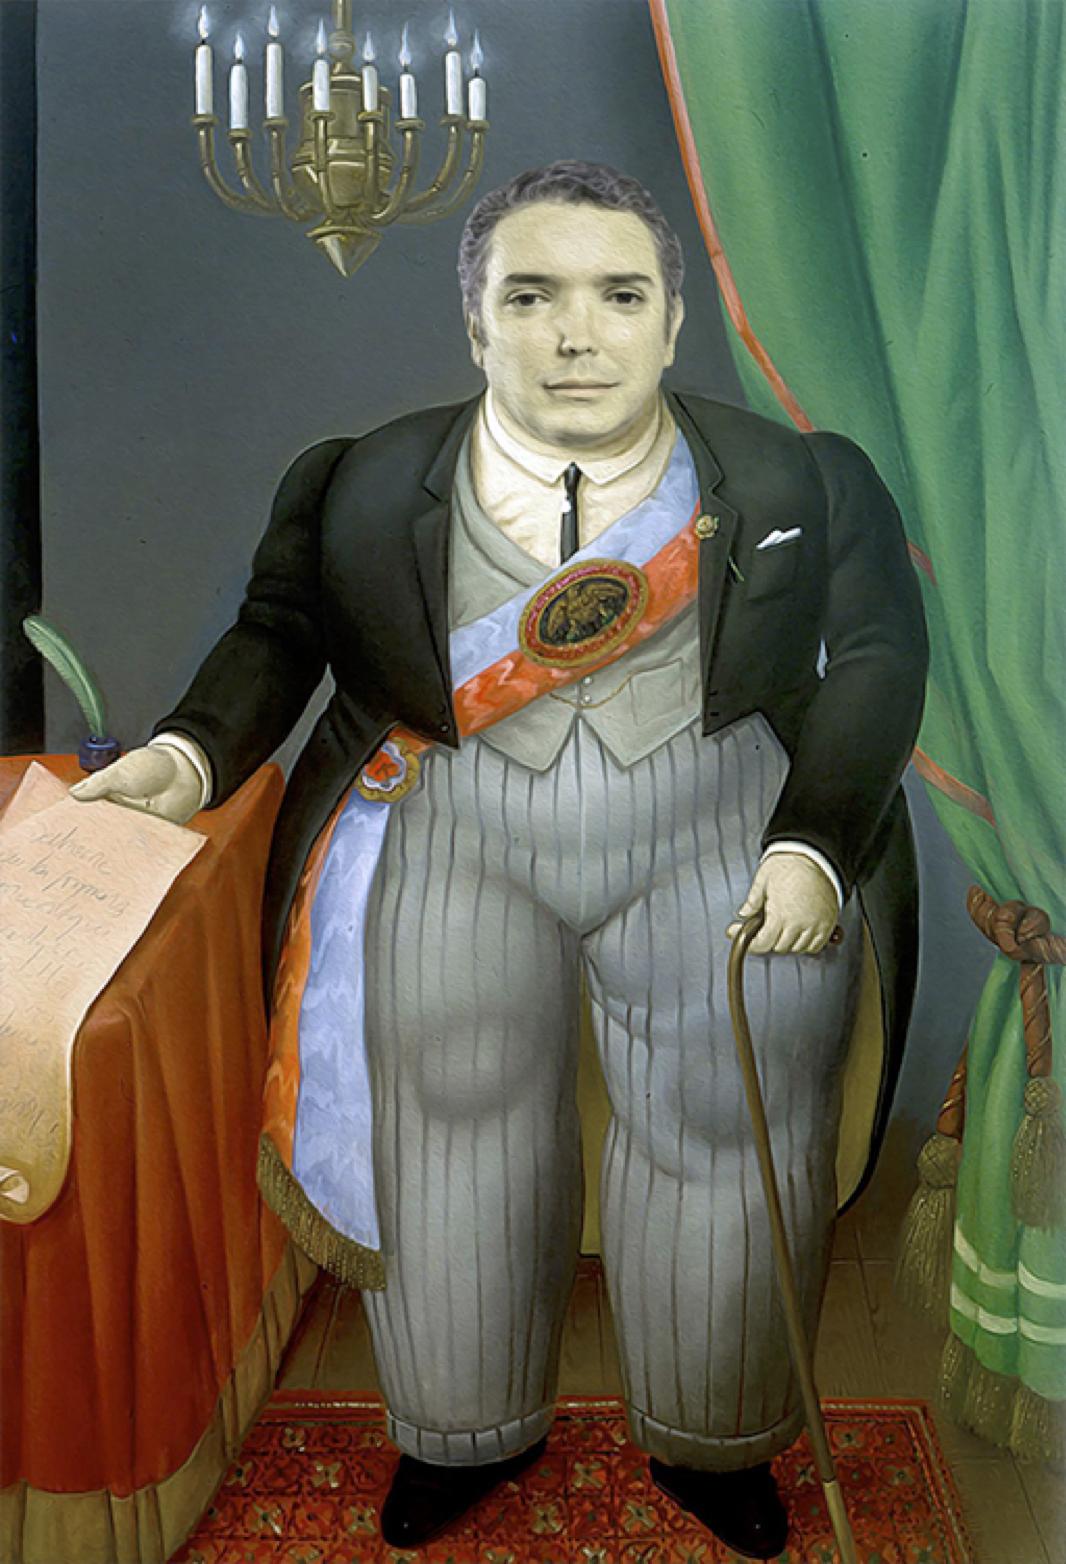 El Presidente, Fernando Botero, 2018, 198 x 130 cm, óleo sobre tela, pintura...